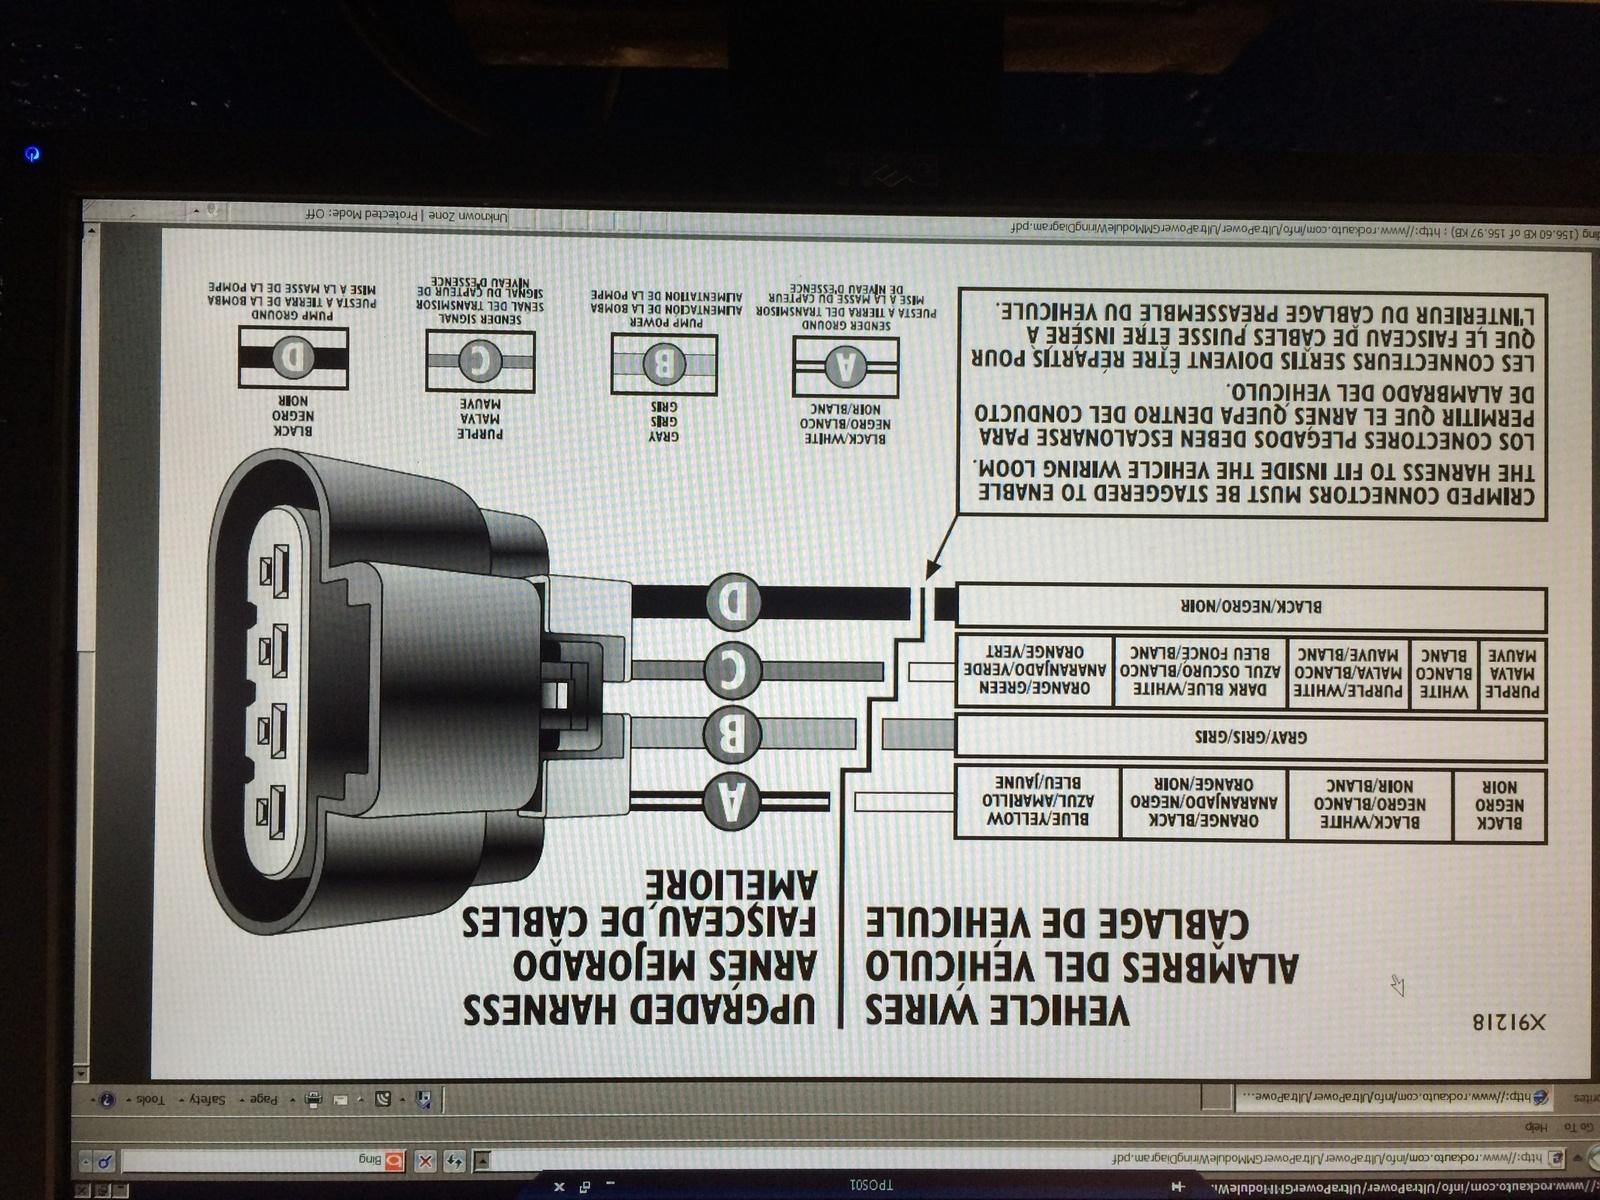 Gmc Sierra 1500 Questions - Fuel Pump Not Engaging On 1998 Gmc K1500 - 1998 Chevy Silverado Fuel Pump Wiring Diagram